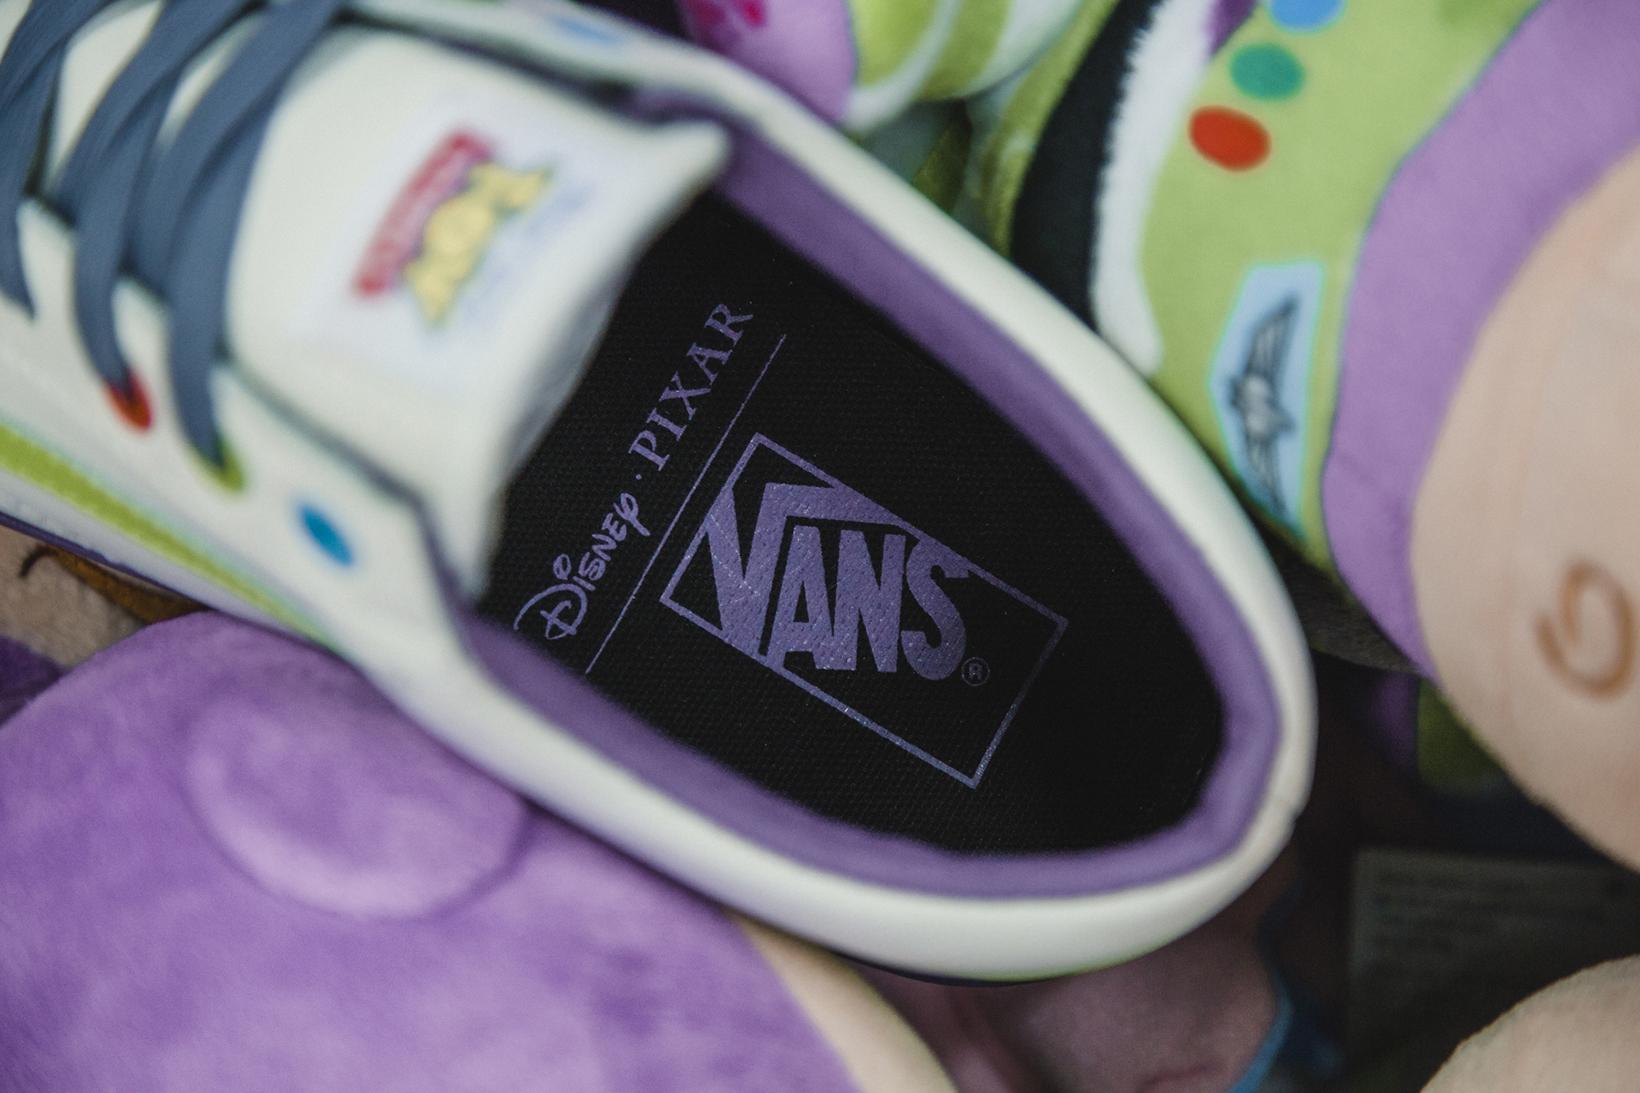 Toy Story Vans Sneakers Woody Buzz Lightyear Disney - 1765032